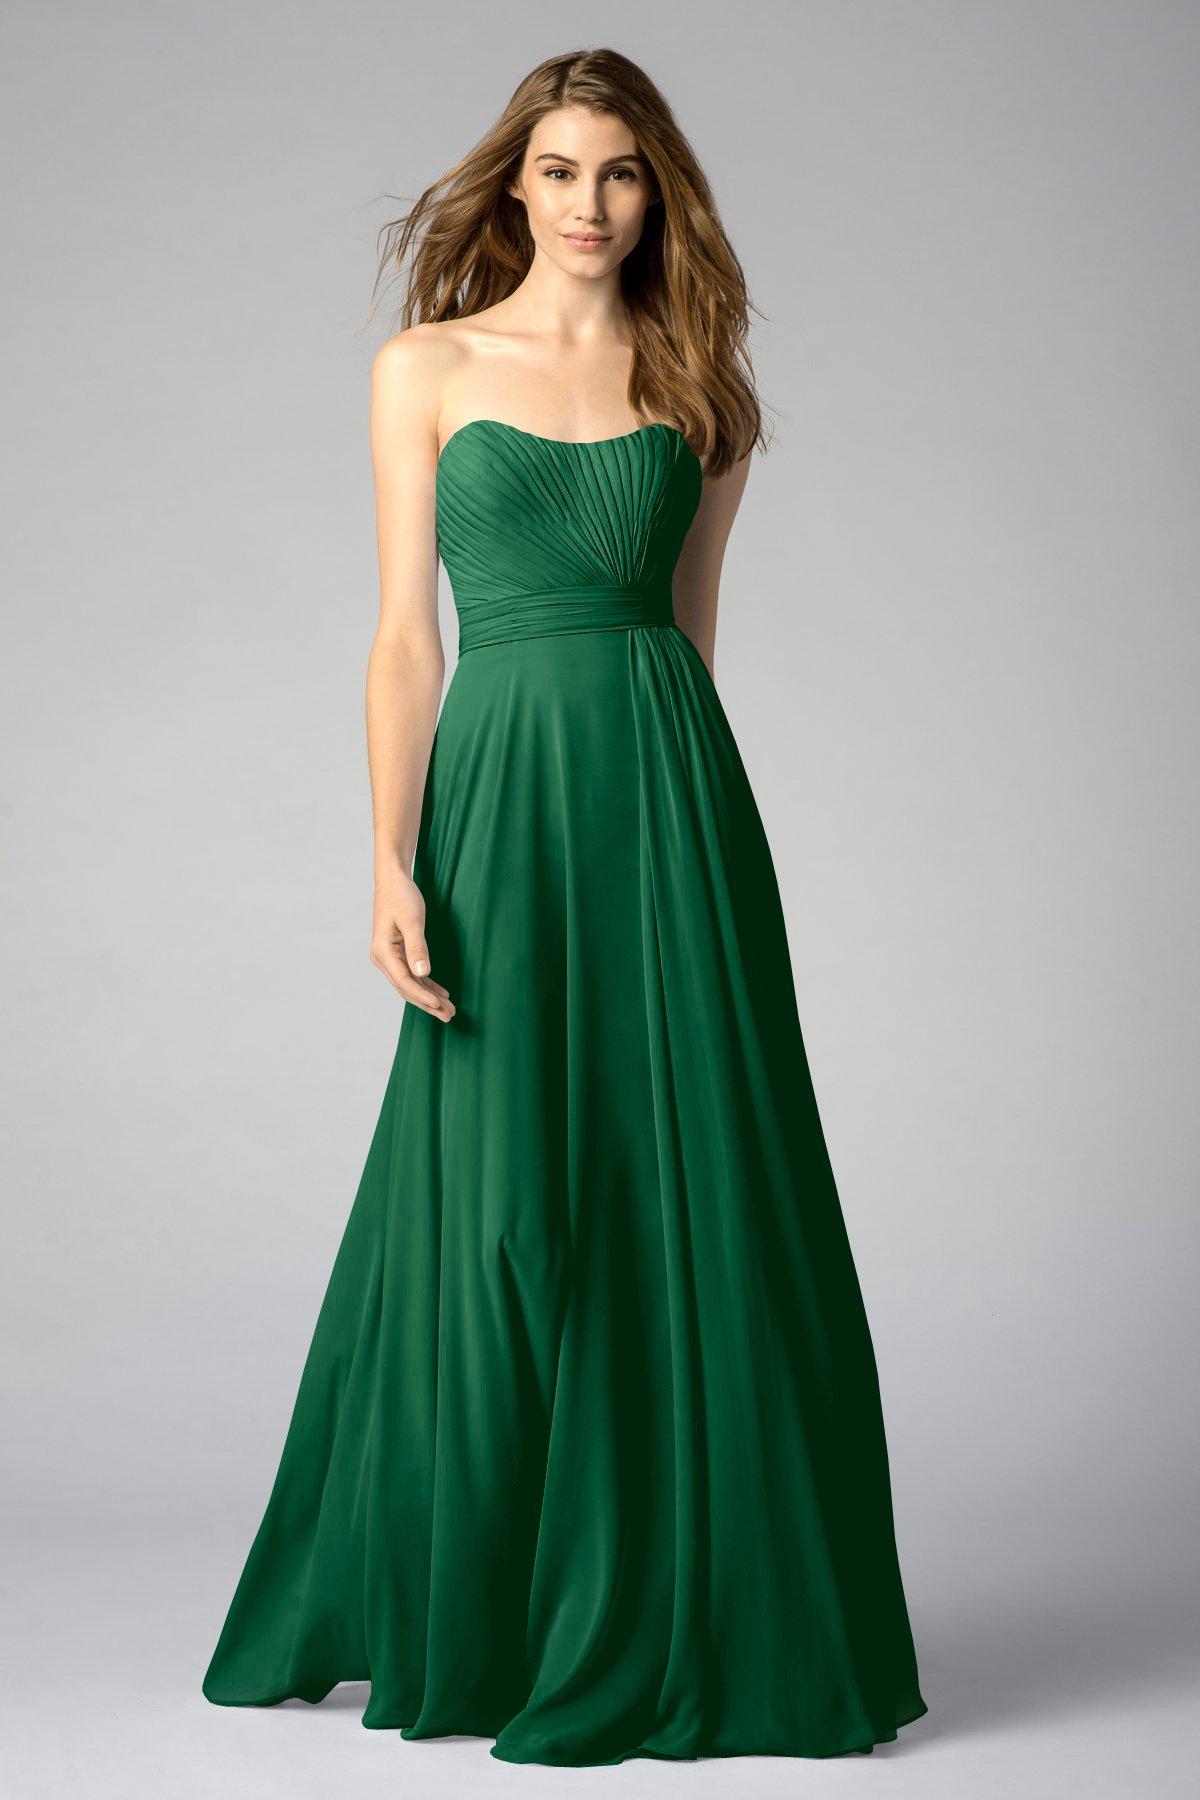 Green bridesmaid dresses uk high street